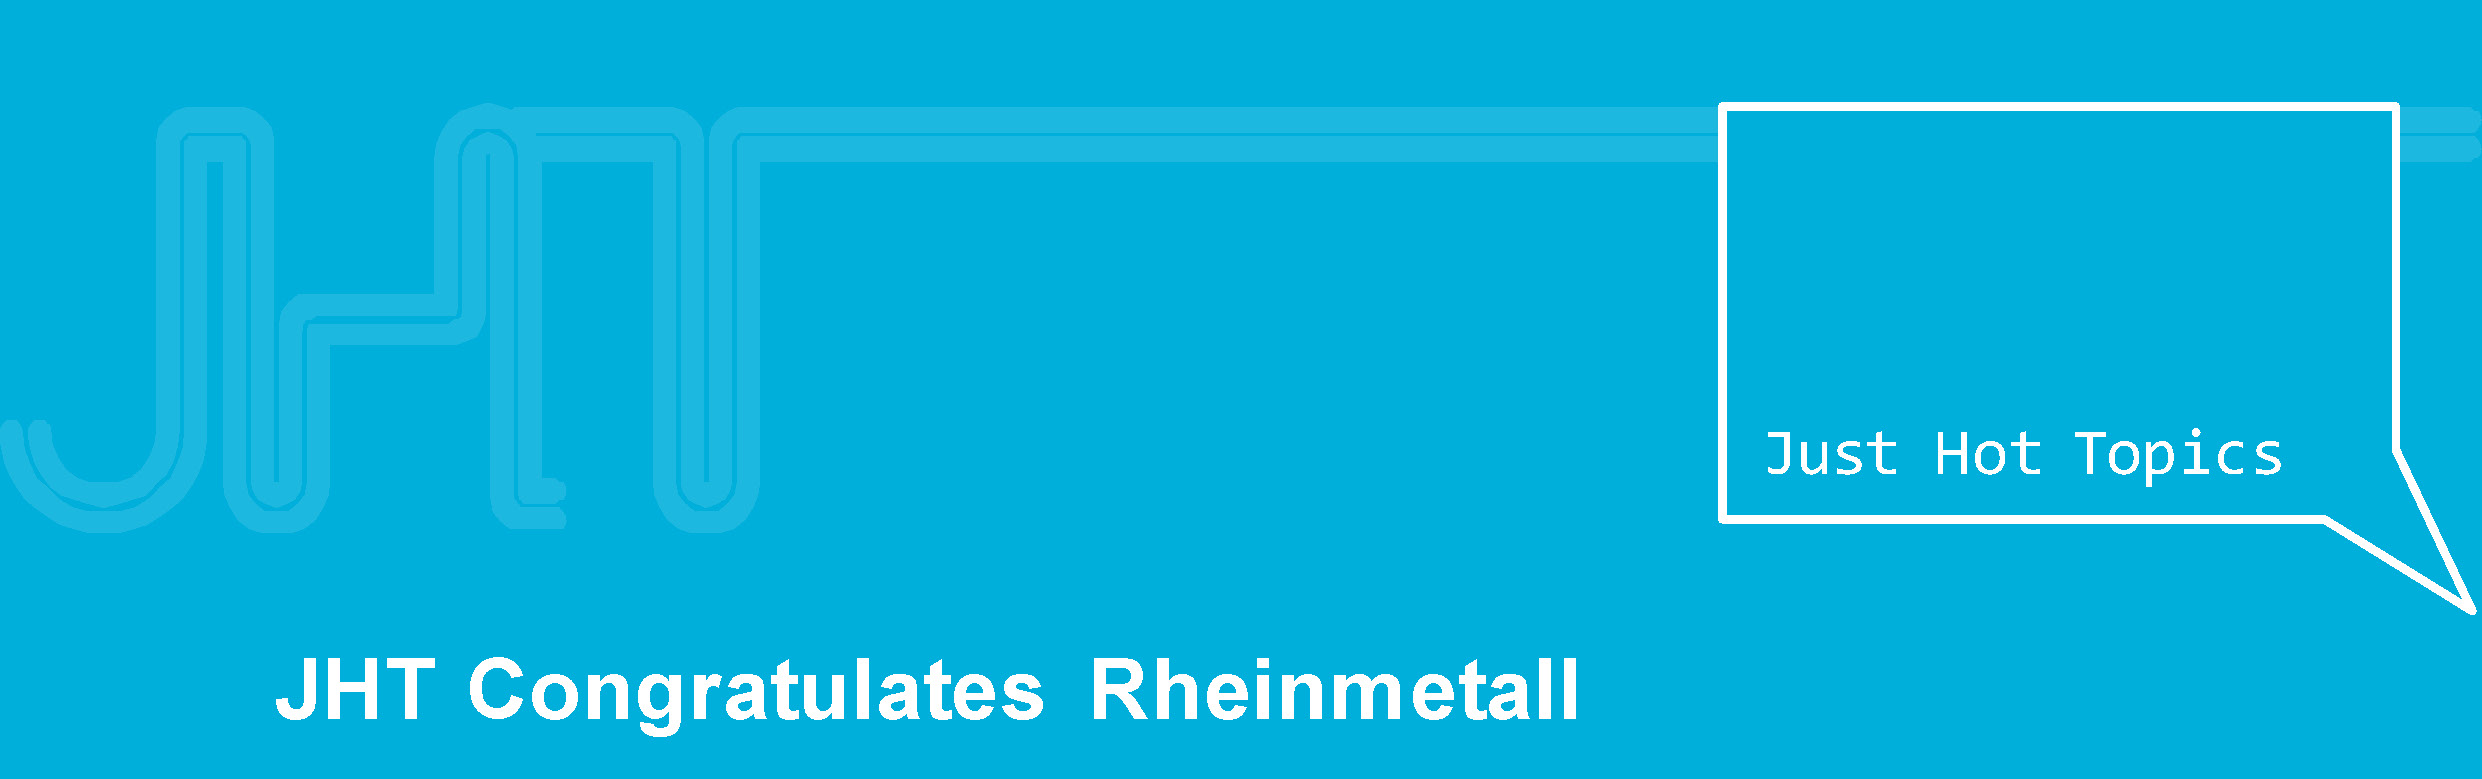 JHT Congratulates Rheinmetall image